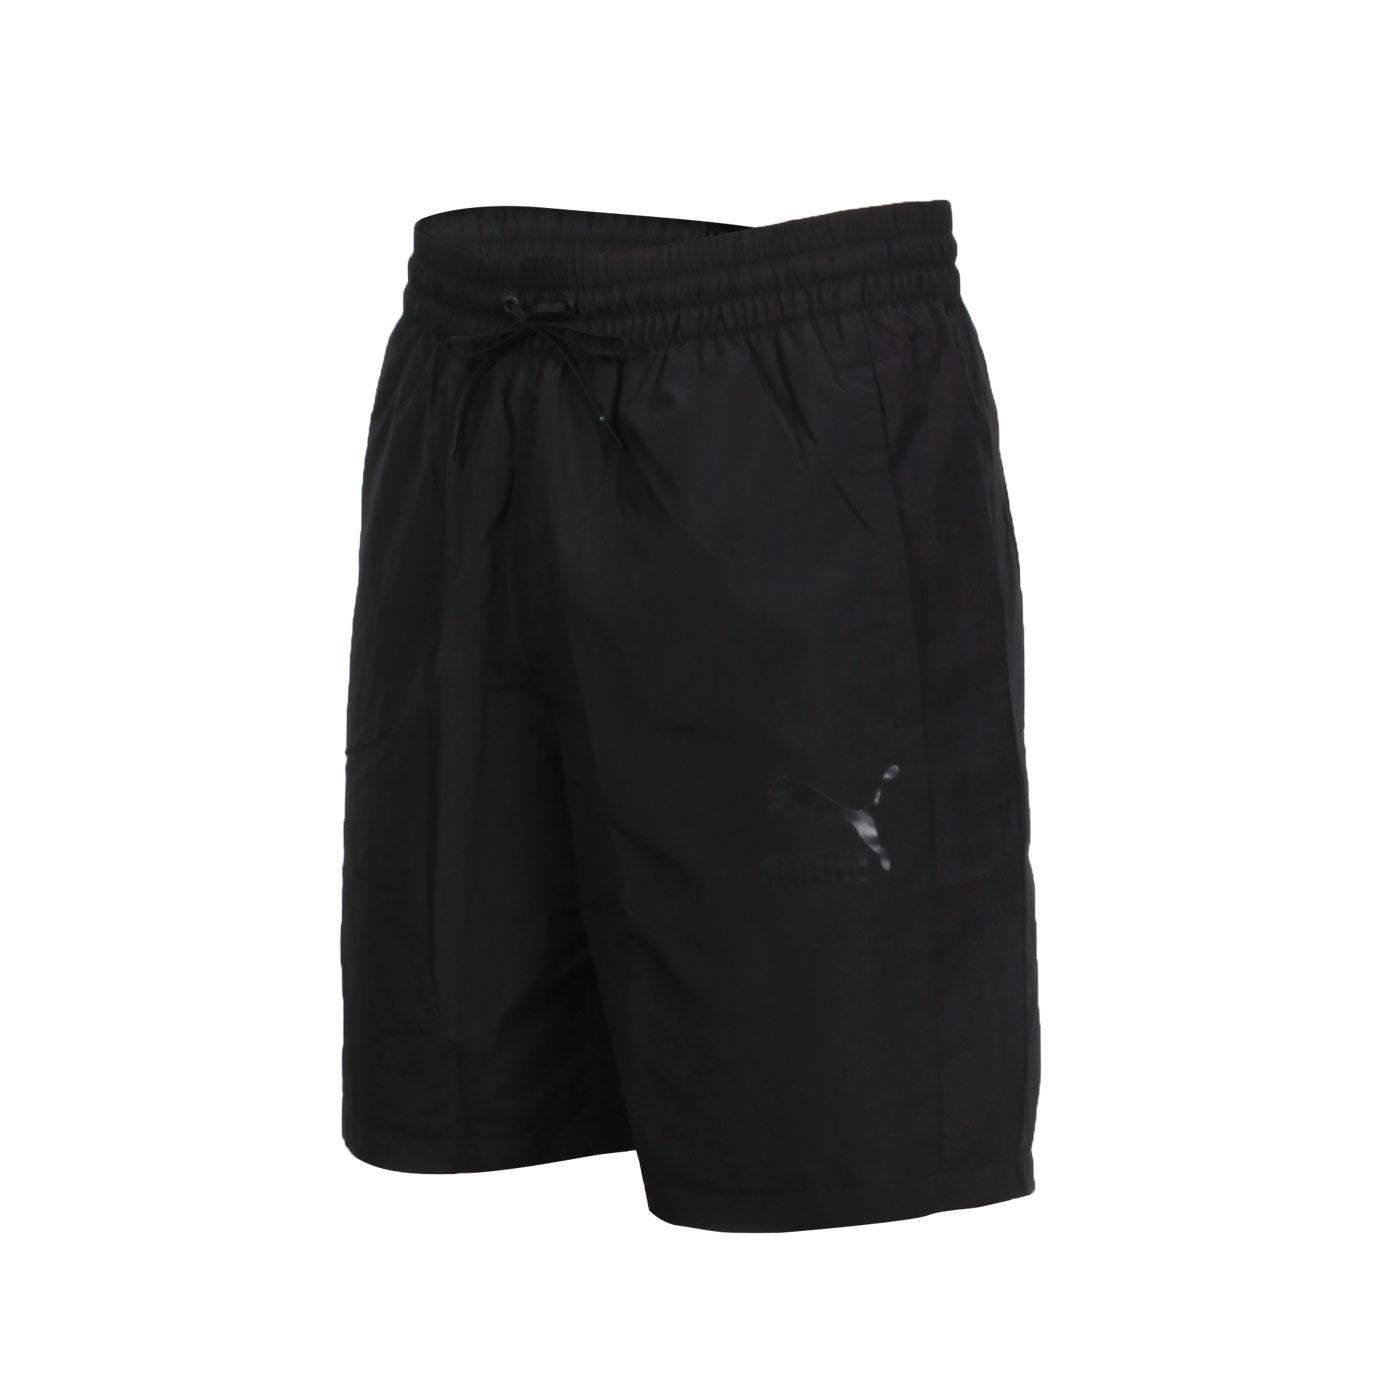 PUMA 男款8吋短風褲 59768601 - 黑